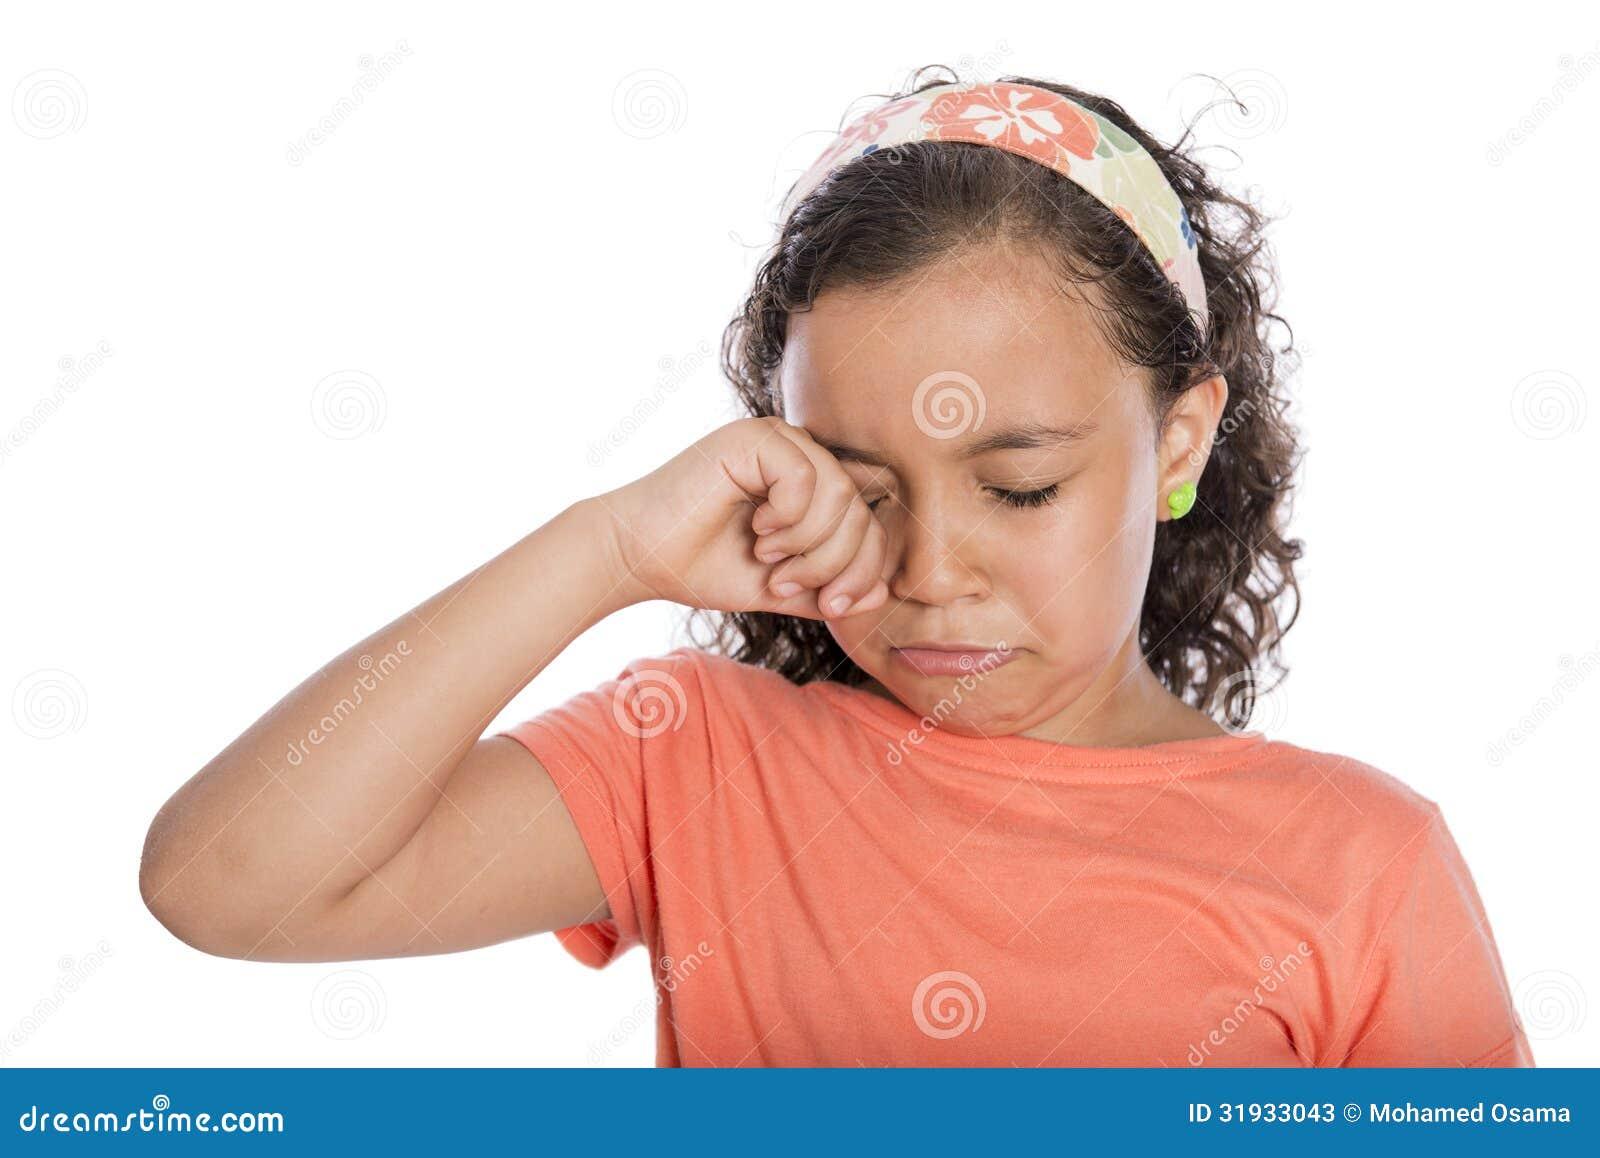 Sad young girl crying isolated on white background